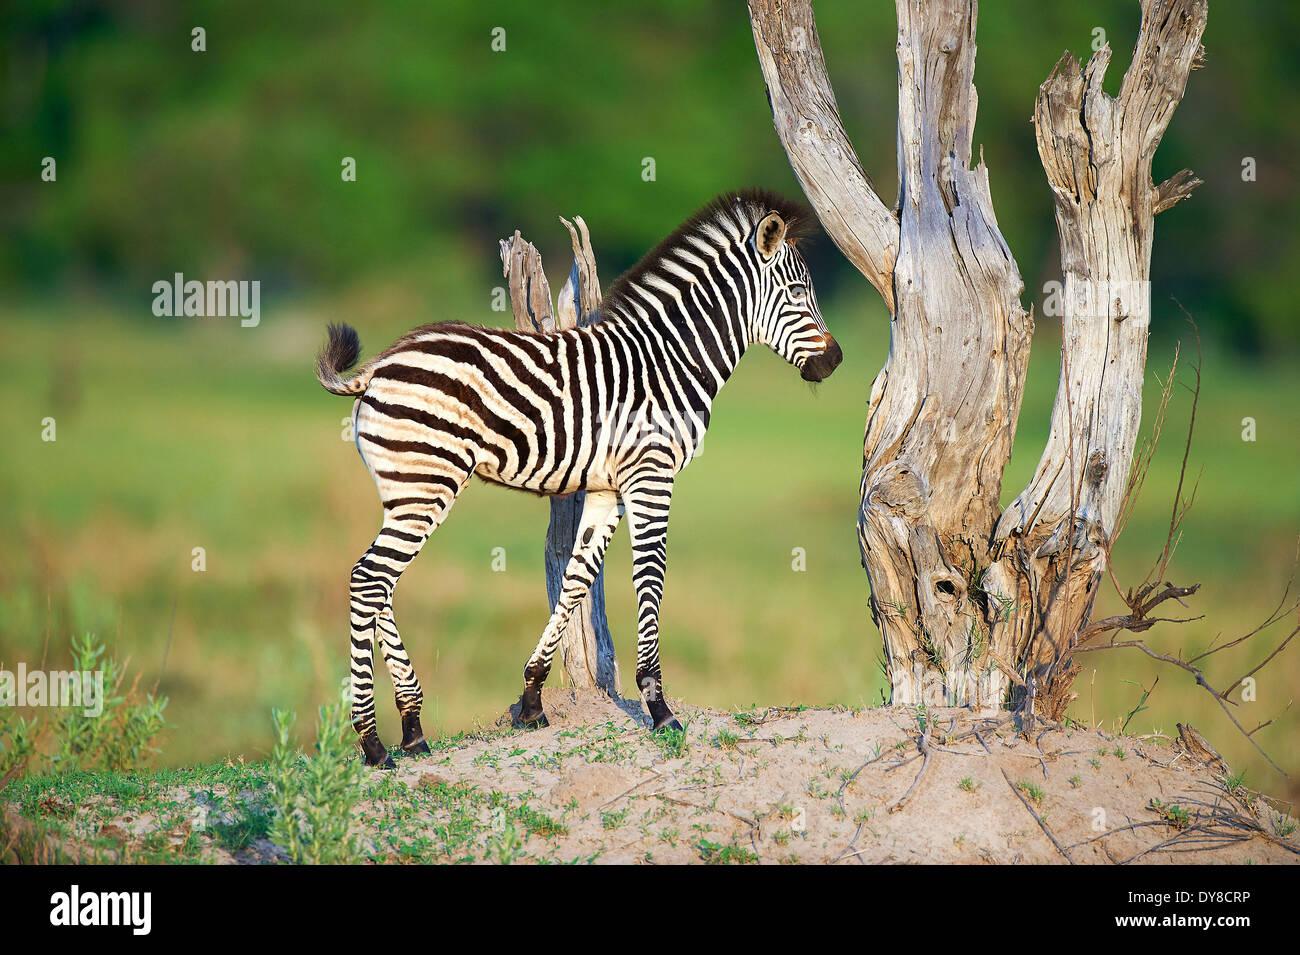 Botswana, Africa, Moremi, zebra, animal, - Stock Image